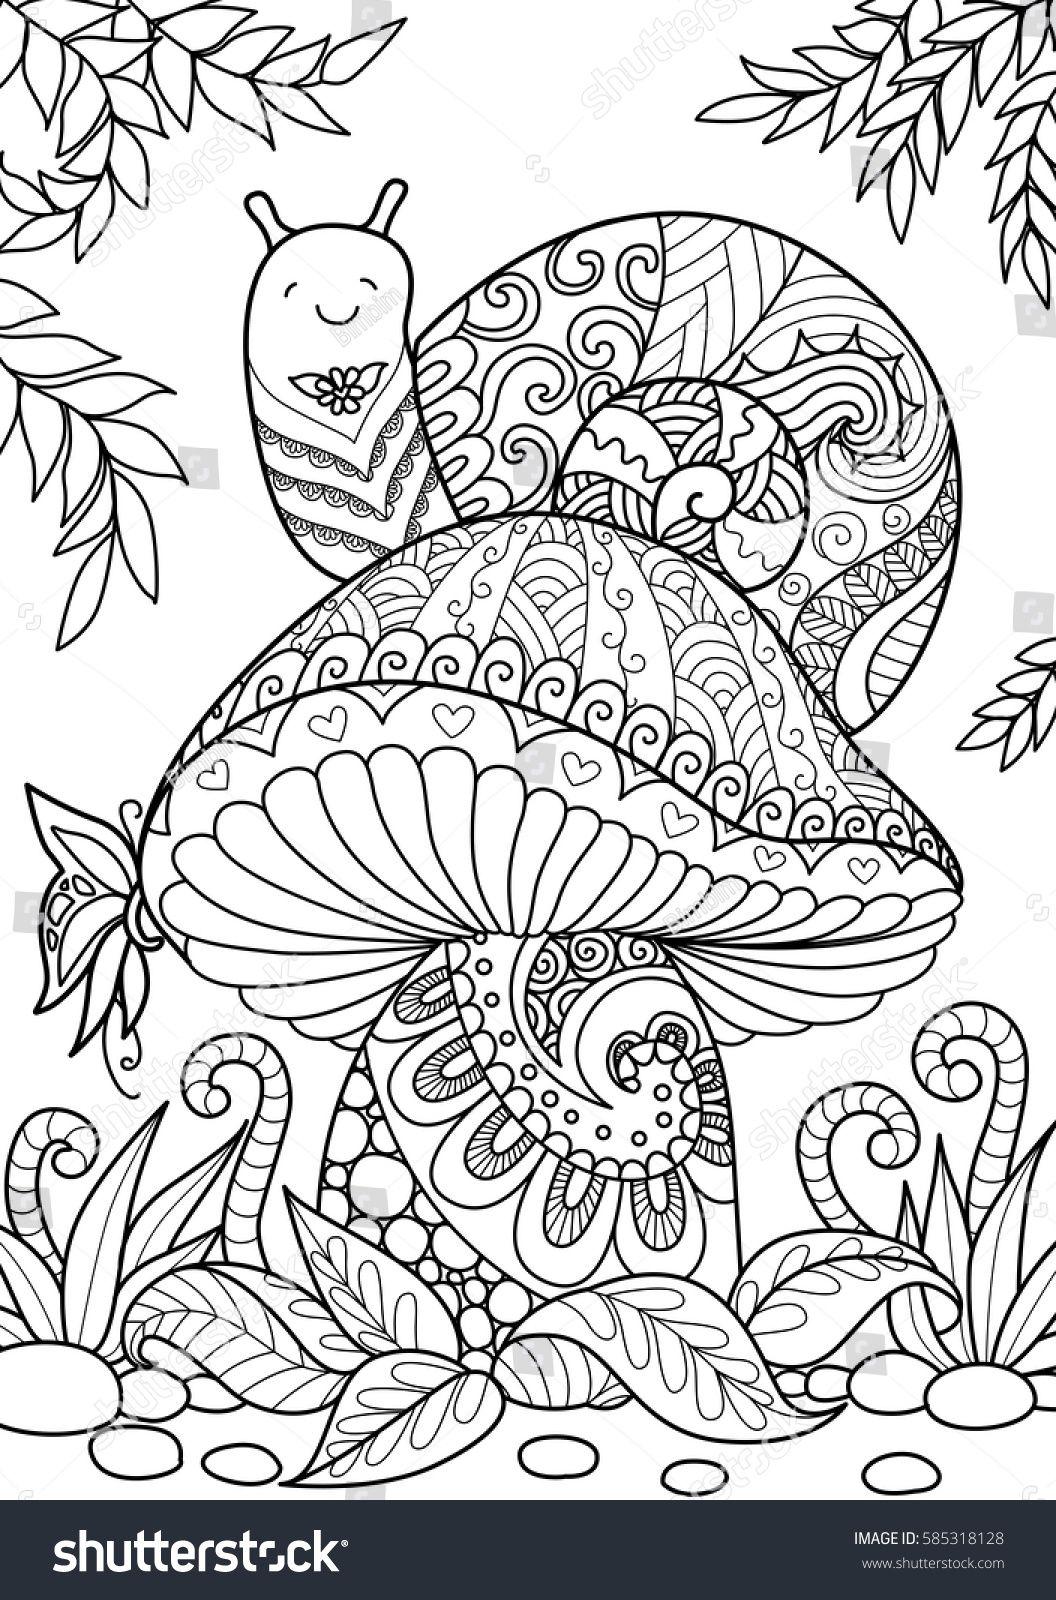 Snail sitting on beautiful mushroom for T-Shirt design, tattoo and ...